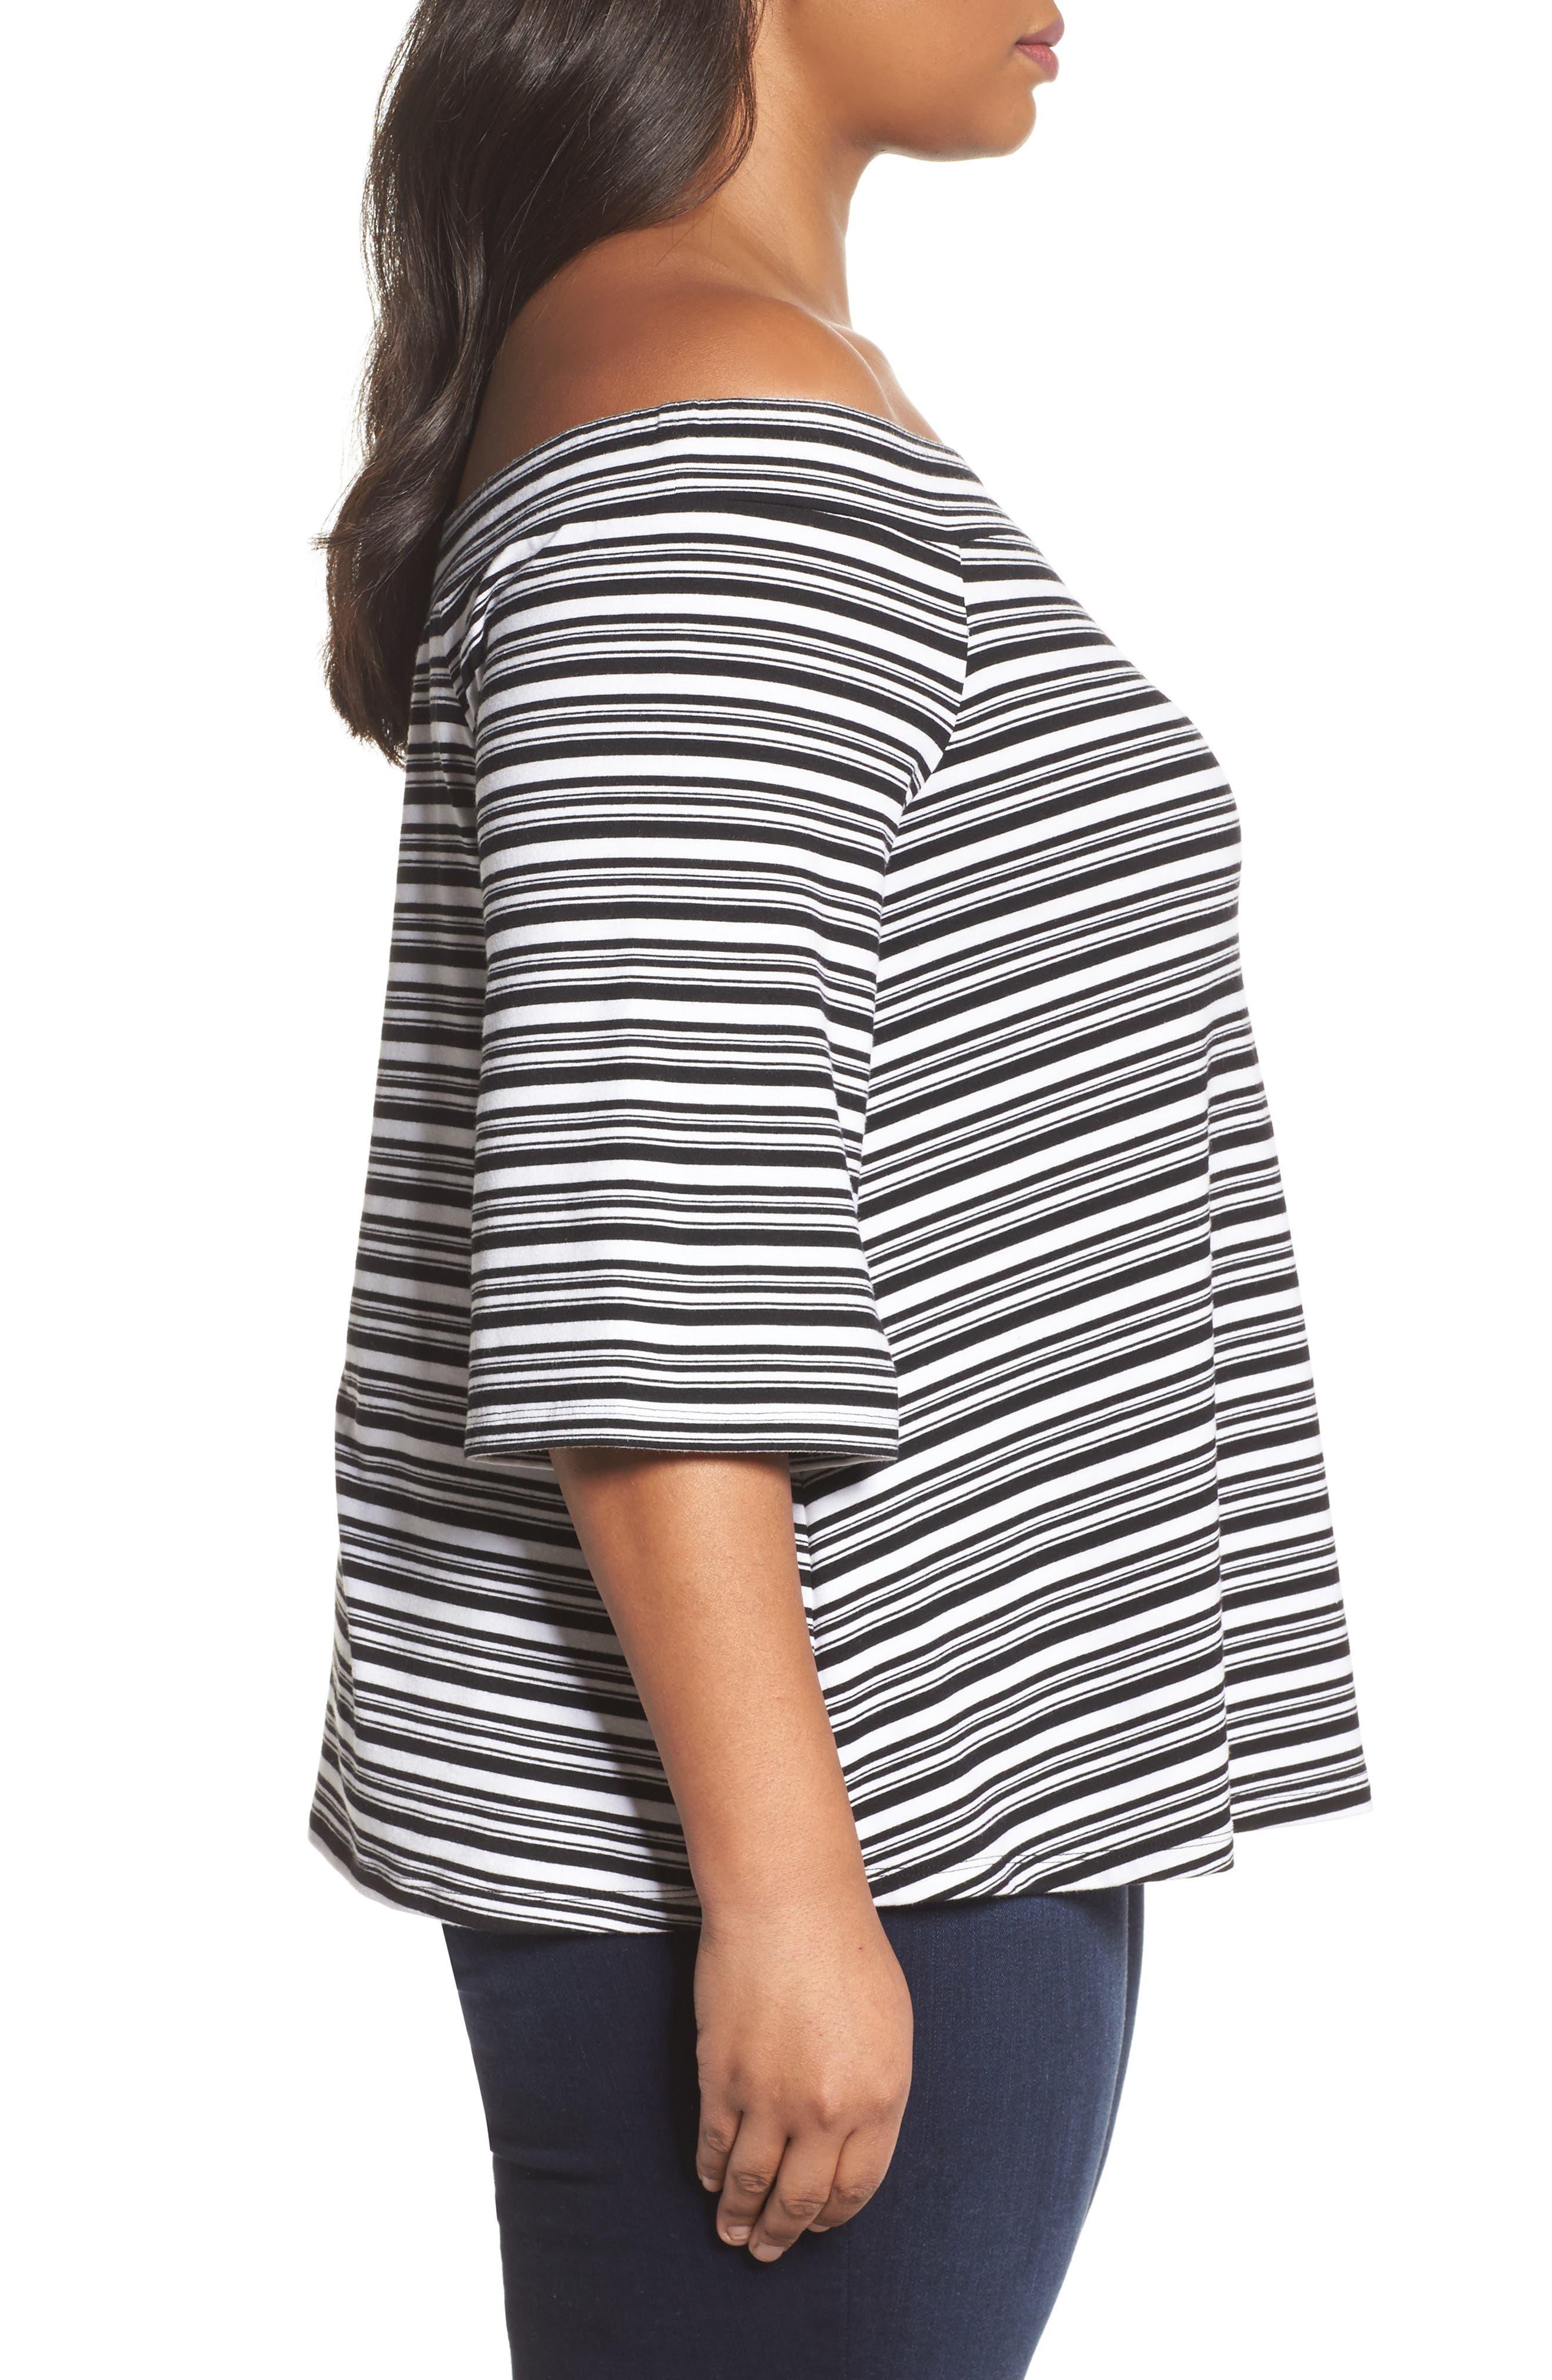 Stripe Off the Shoulder Top,                             Alternate thumbnail 3, color,                             Black- White Veriegated Stripe